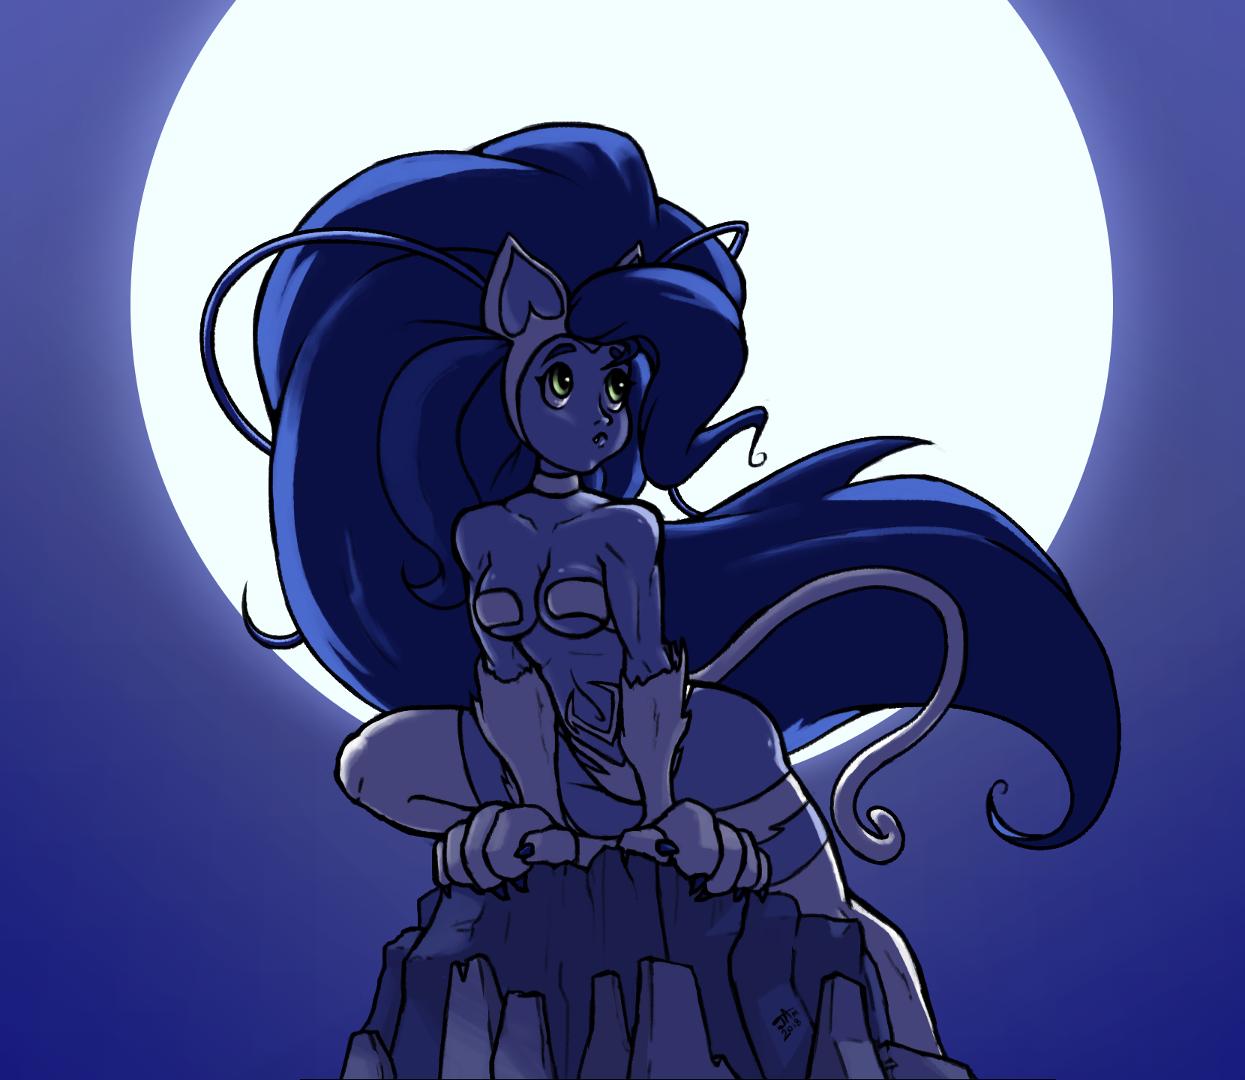 Full Moon Felicia